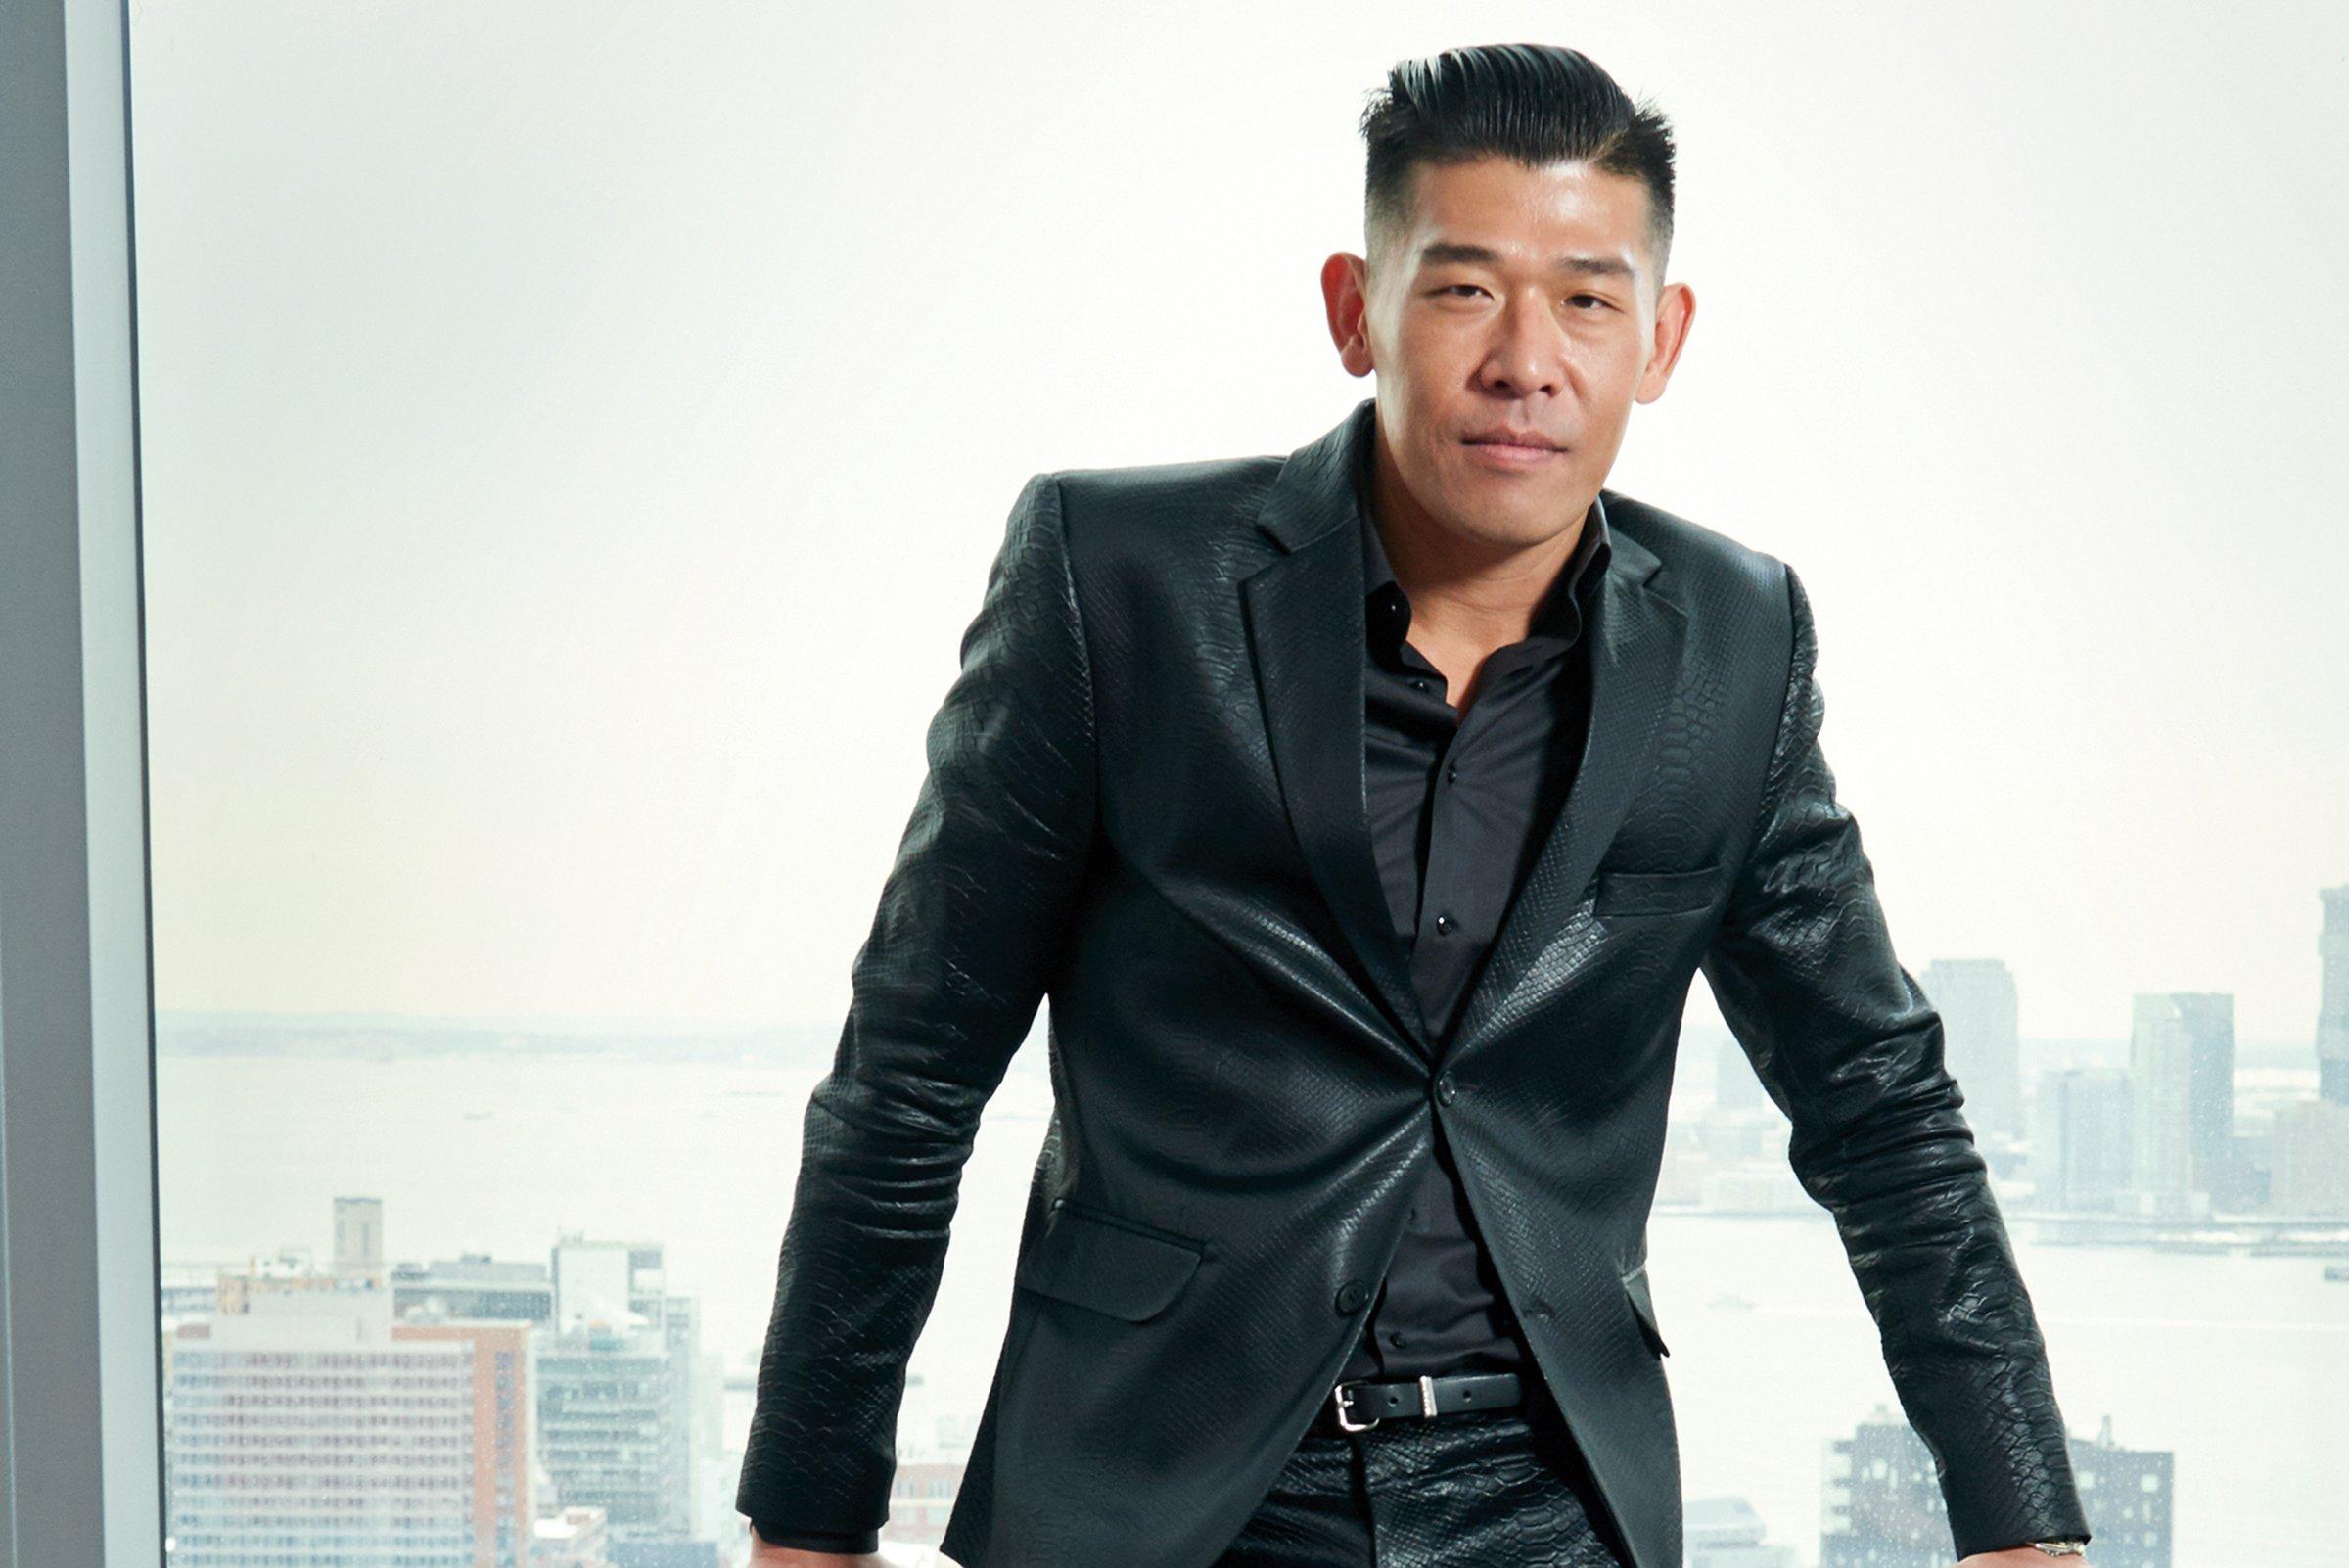 Sam Cheow, Ehemaliger Trend Kopf für LOréal USA, Startet Aromatherapie Micro-Marke